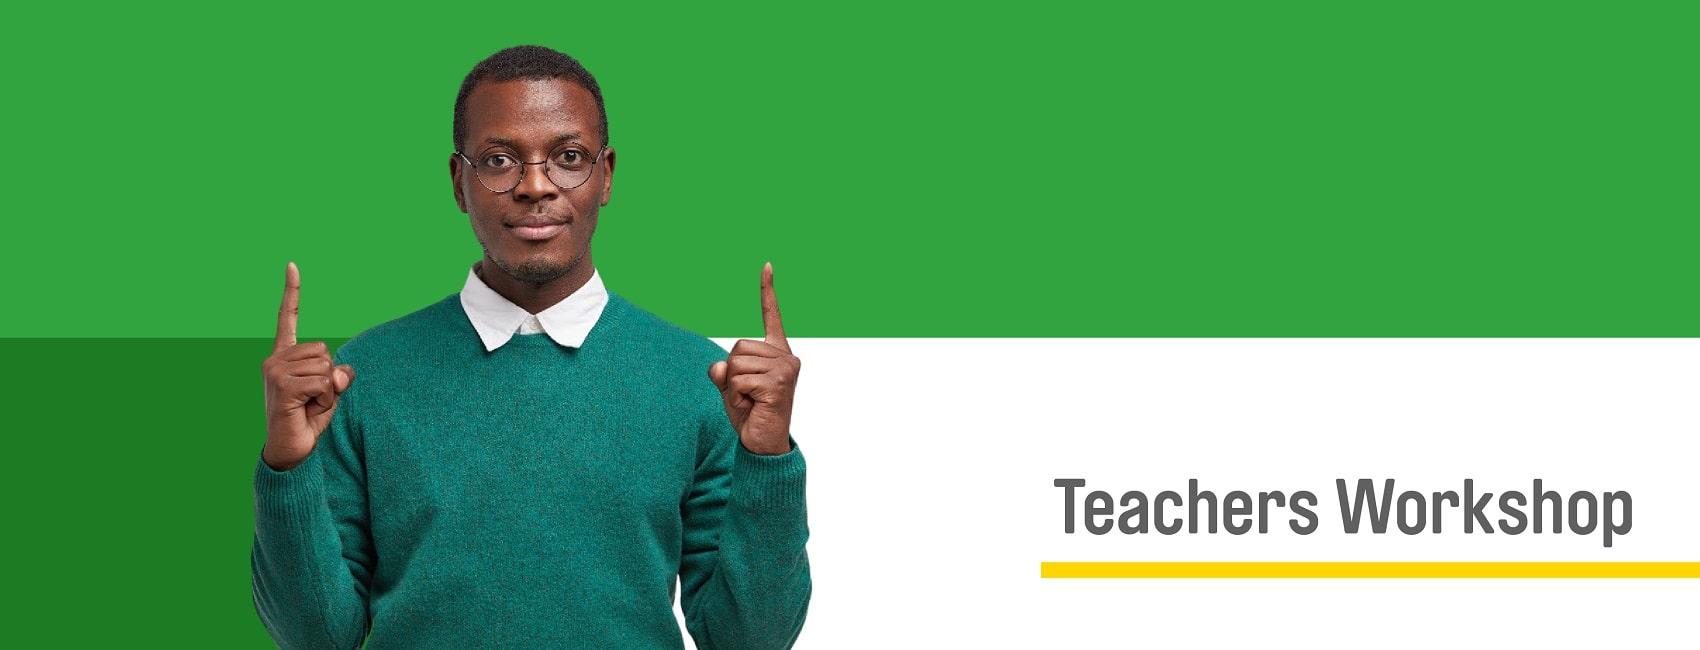 banner-adult-education_teachers-workshop_mesa-de-trabajo-1-copia-9-min